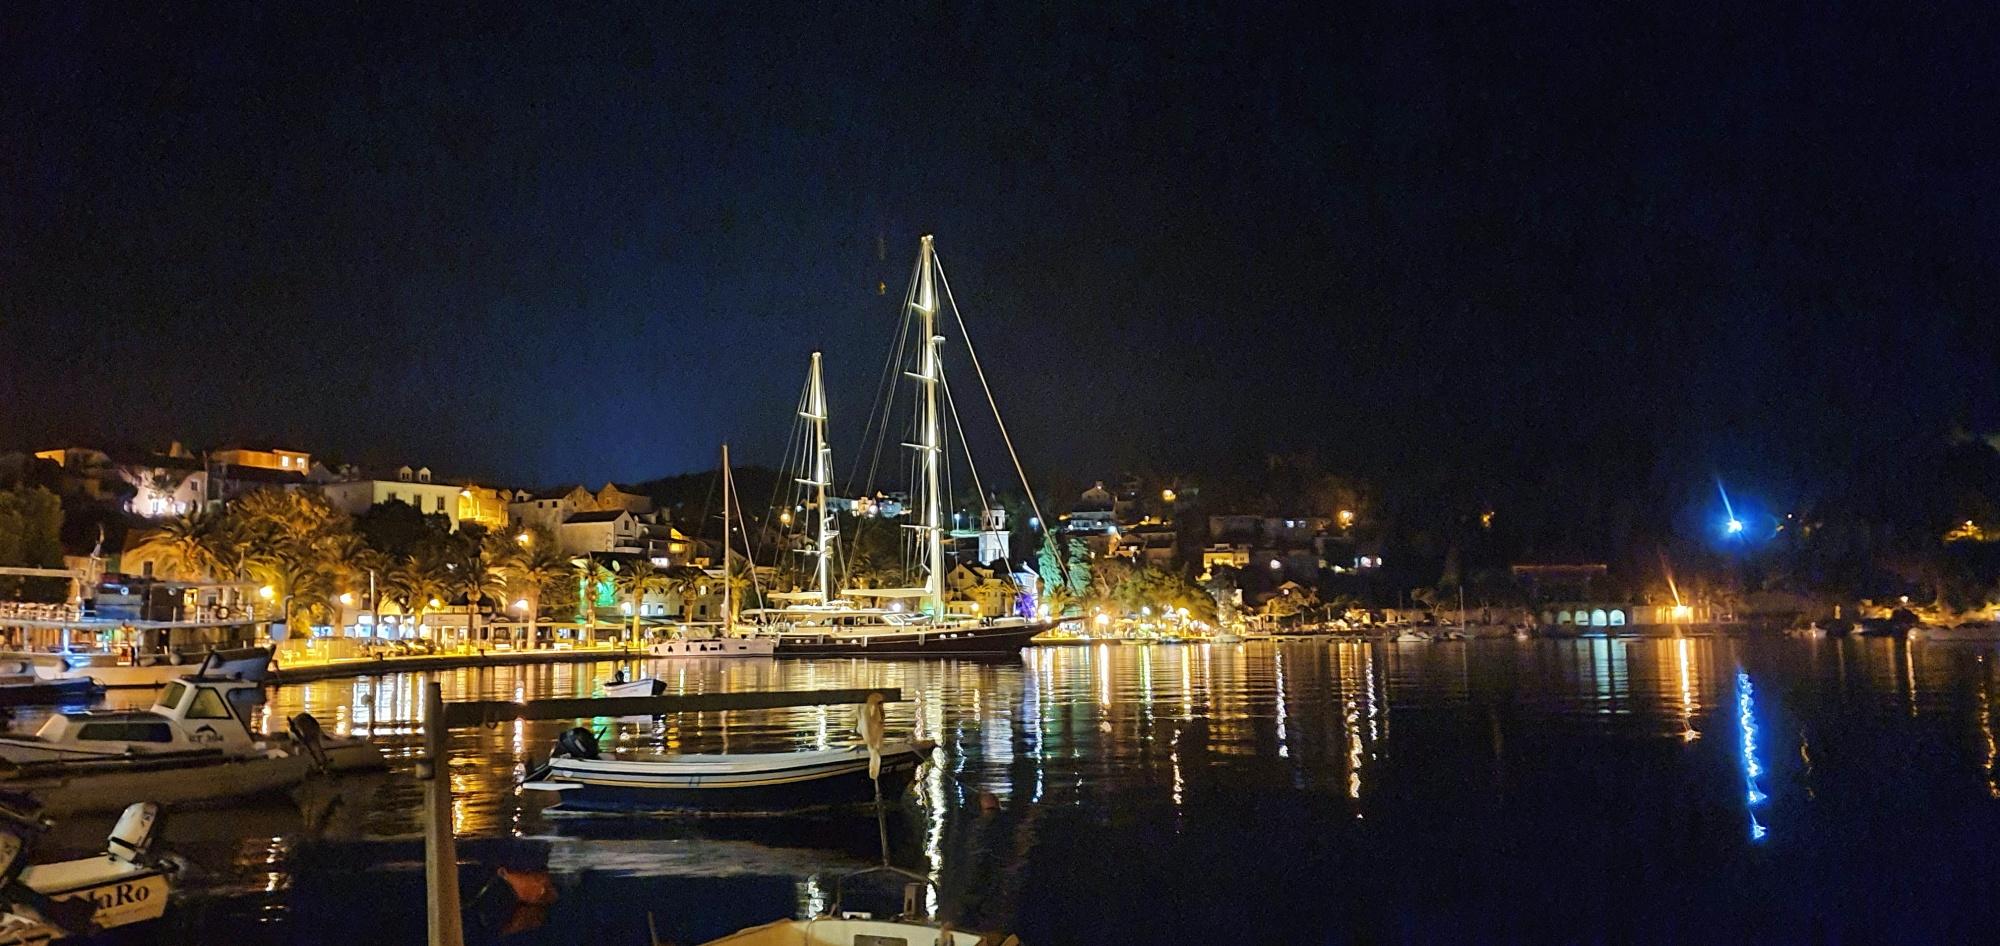 panorama of the Cavtat waterfront at night